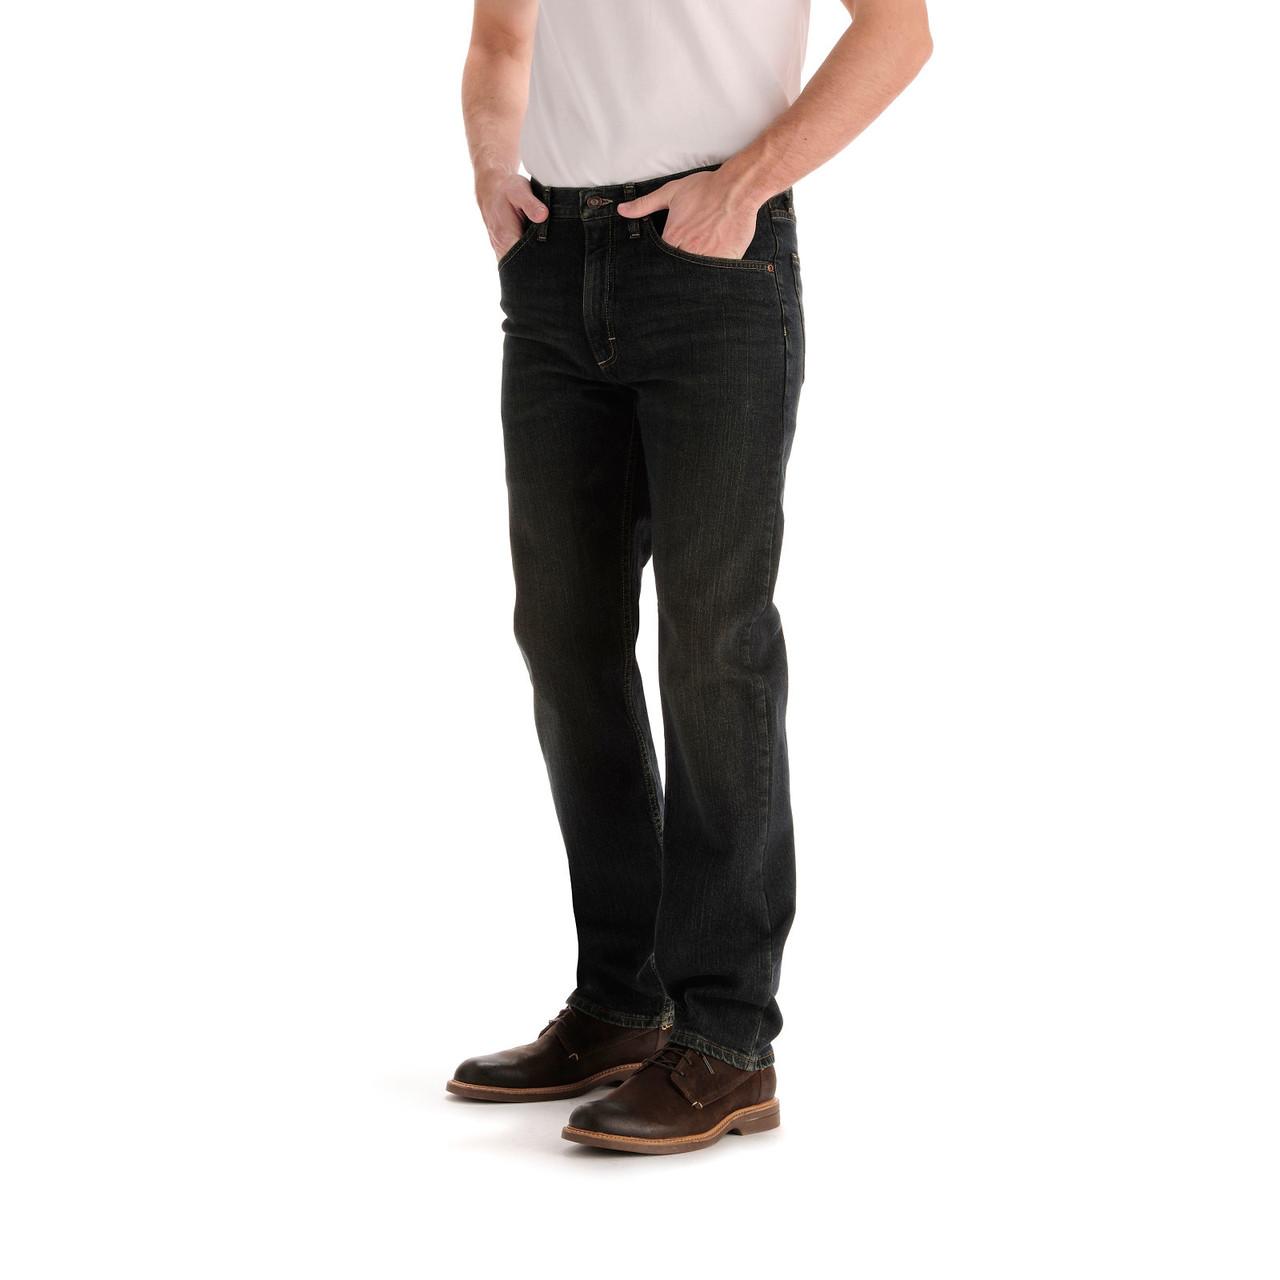 Джинсы Lee Premium Select Regular Fit Straight Leg, Rebel, 38W34L, 2001948